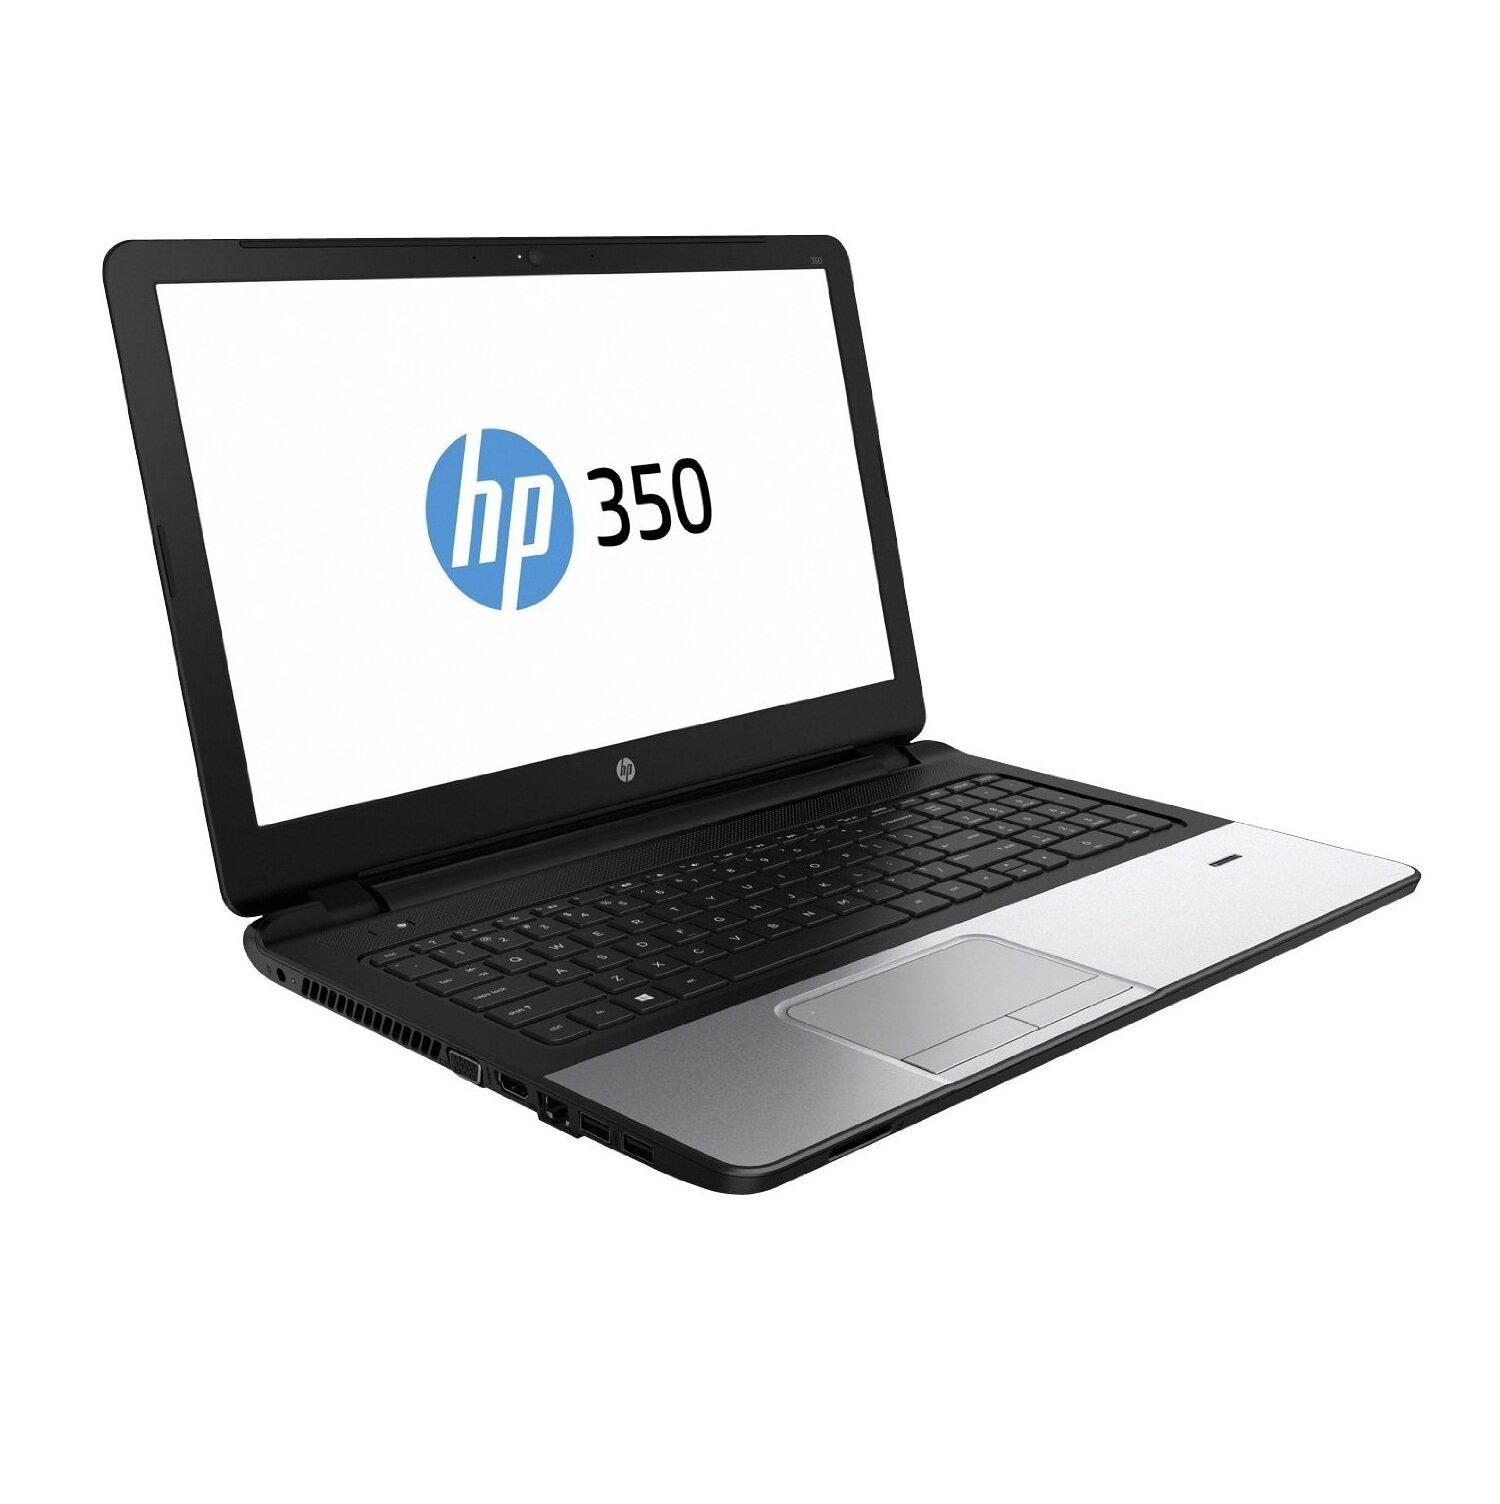 Laptop HP 350 G2 N2N04PA - Intel Core i5 5200U 2.2Ghz, 4Gb RAM, 500Gb HDD, Intel HD Graphics, 15.6Inch